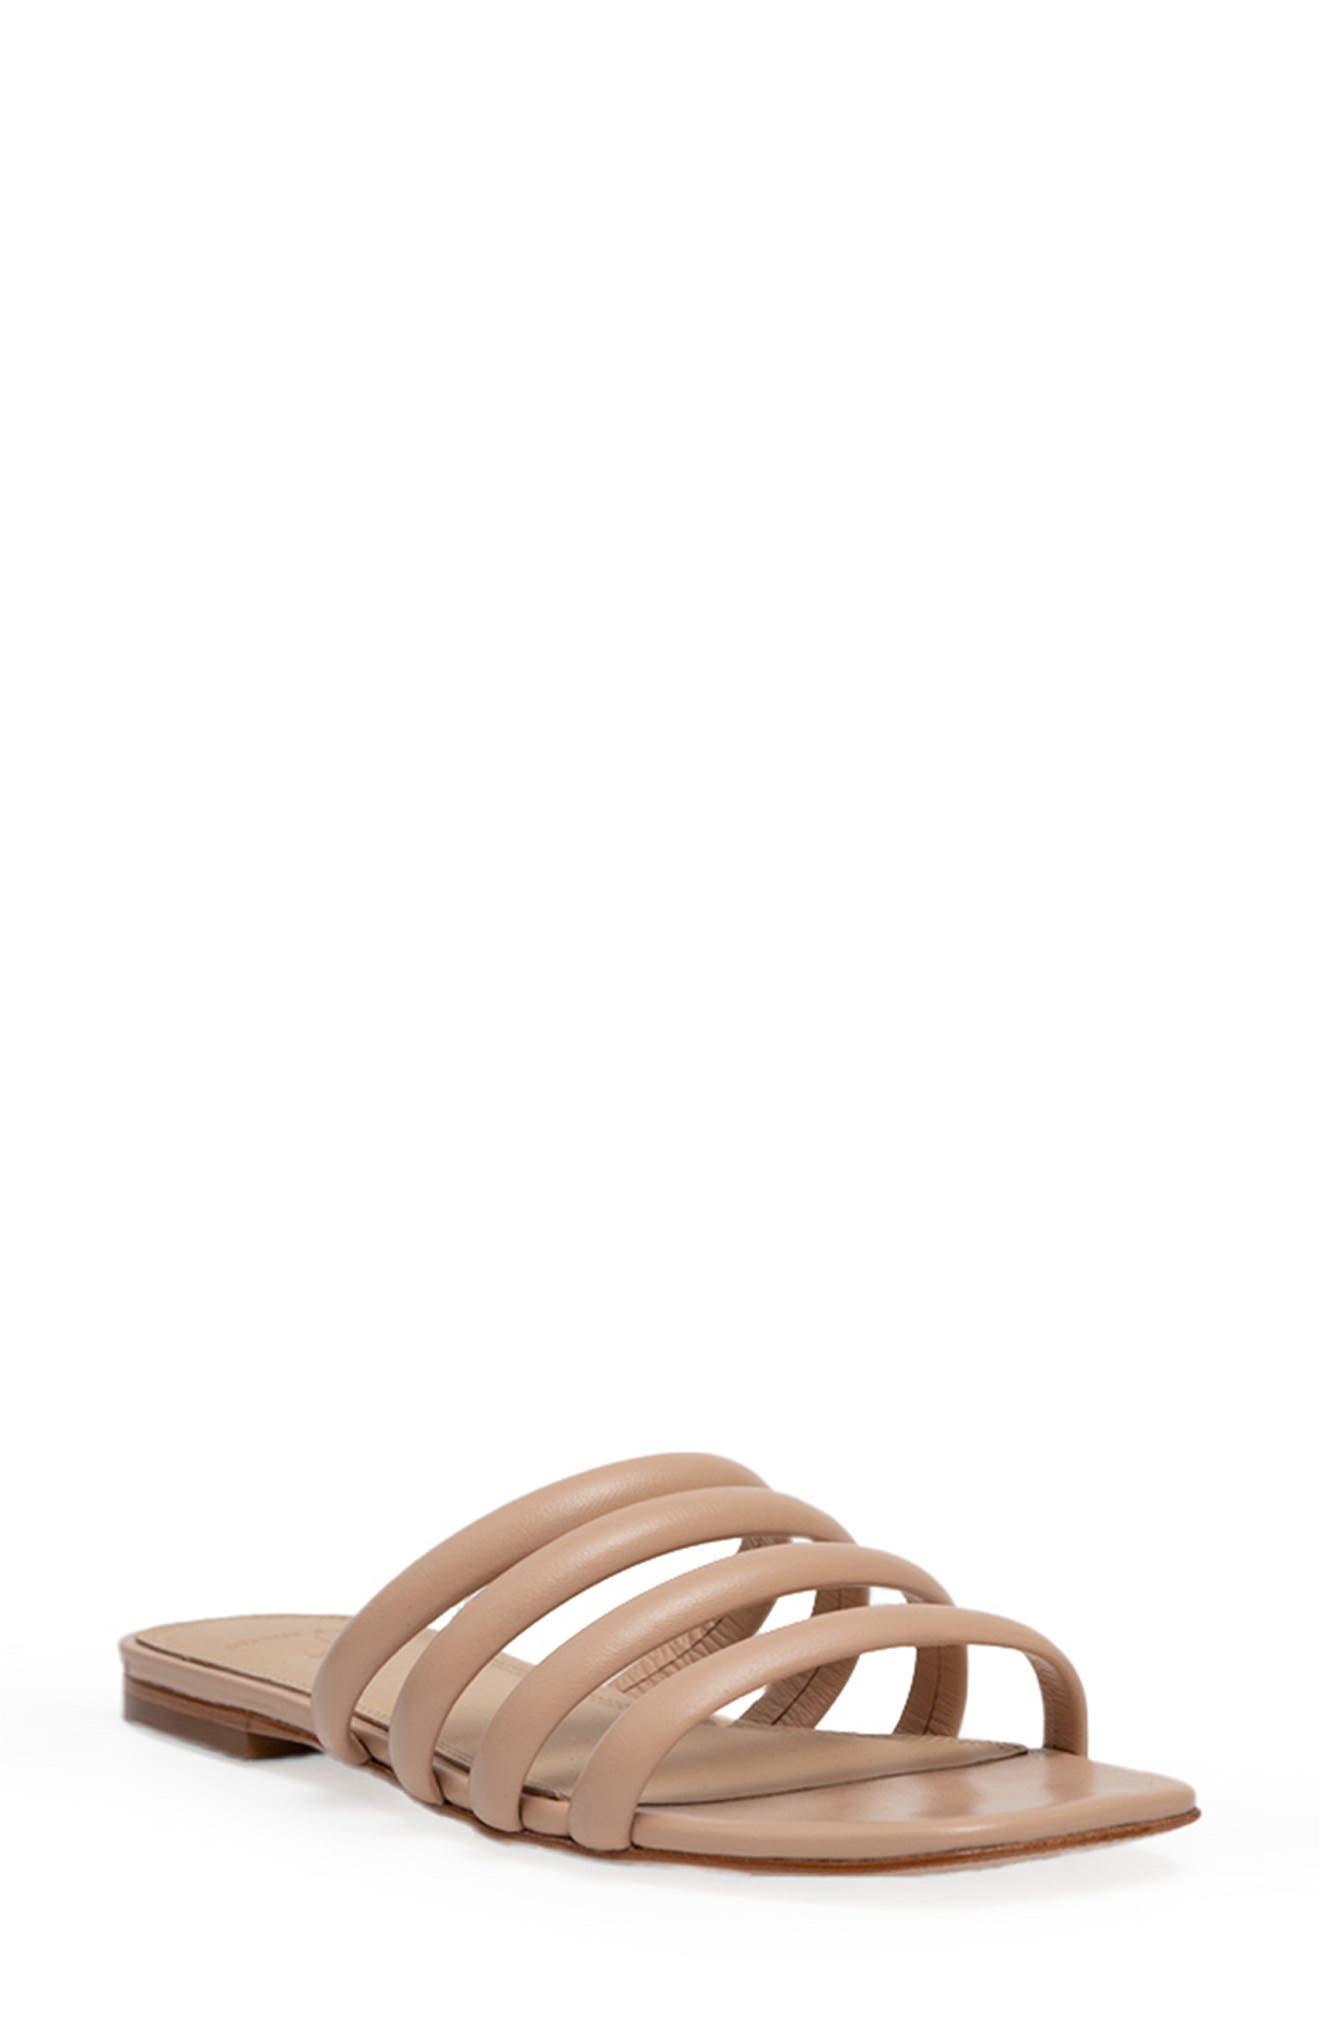 Coco Slide Sandal